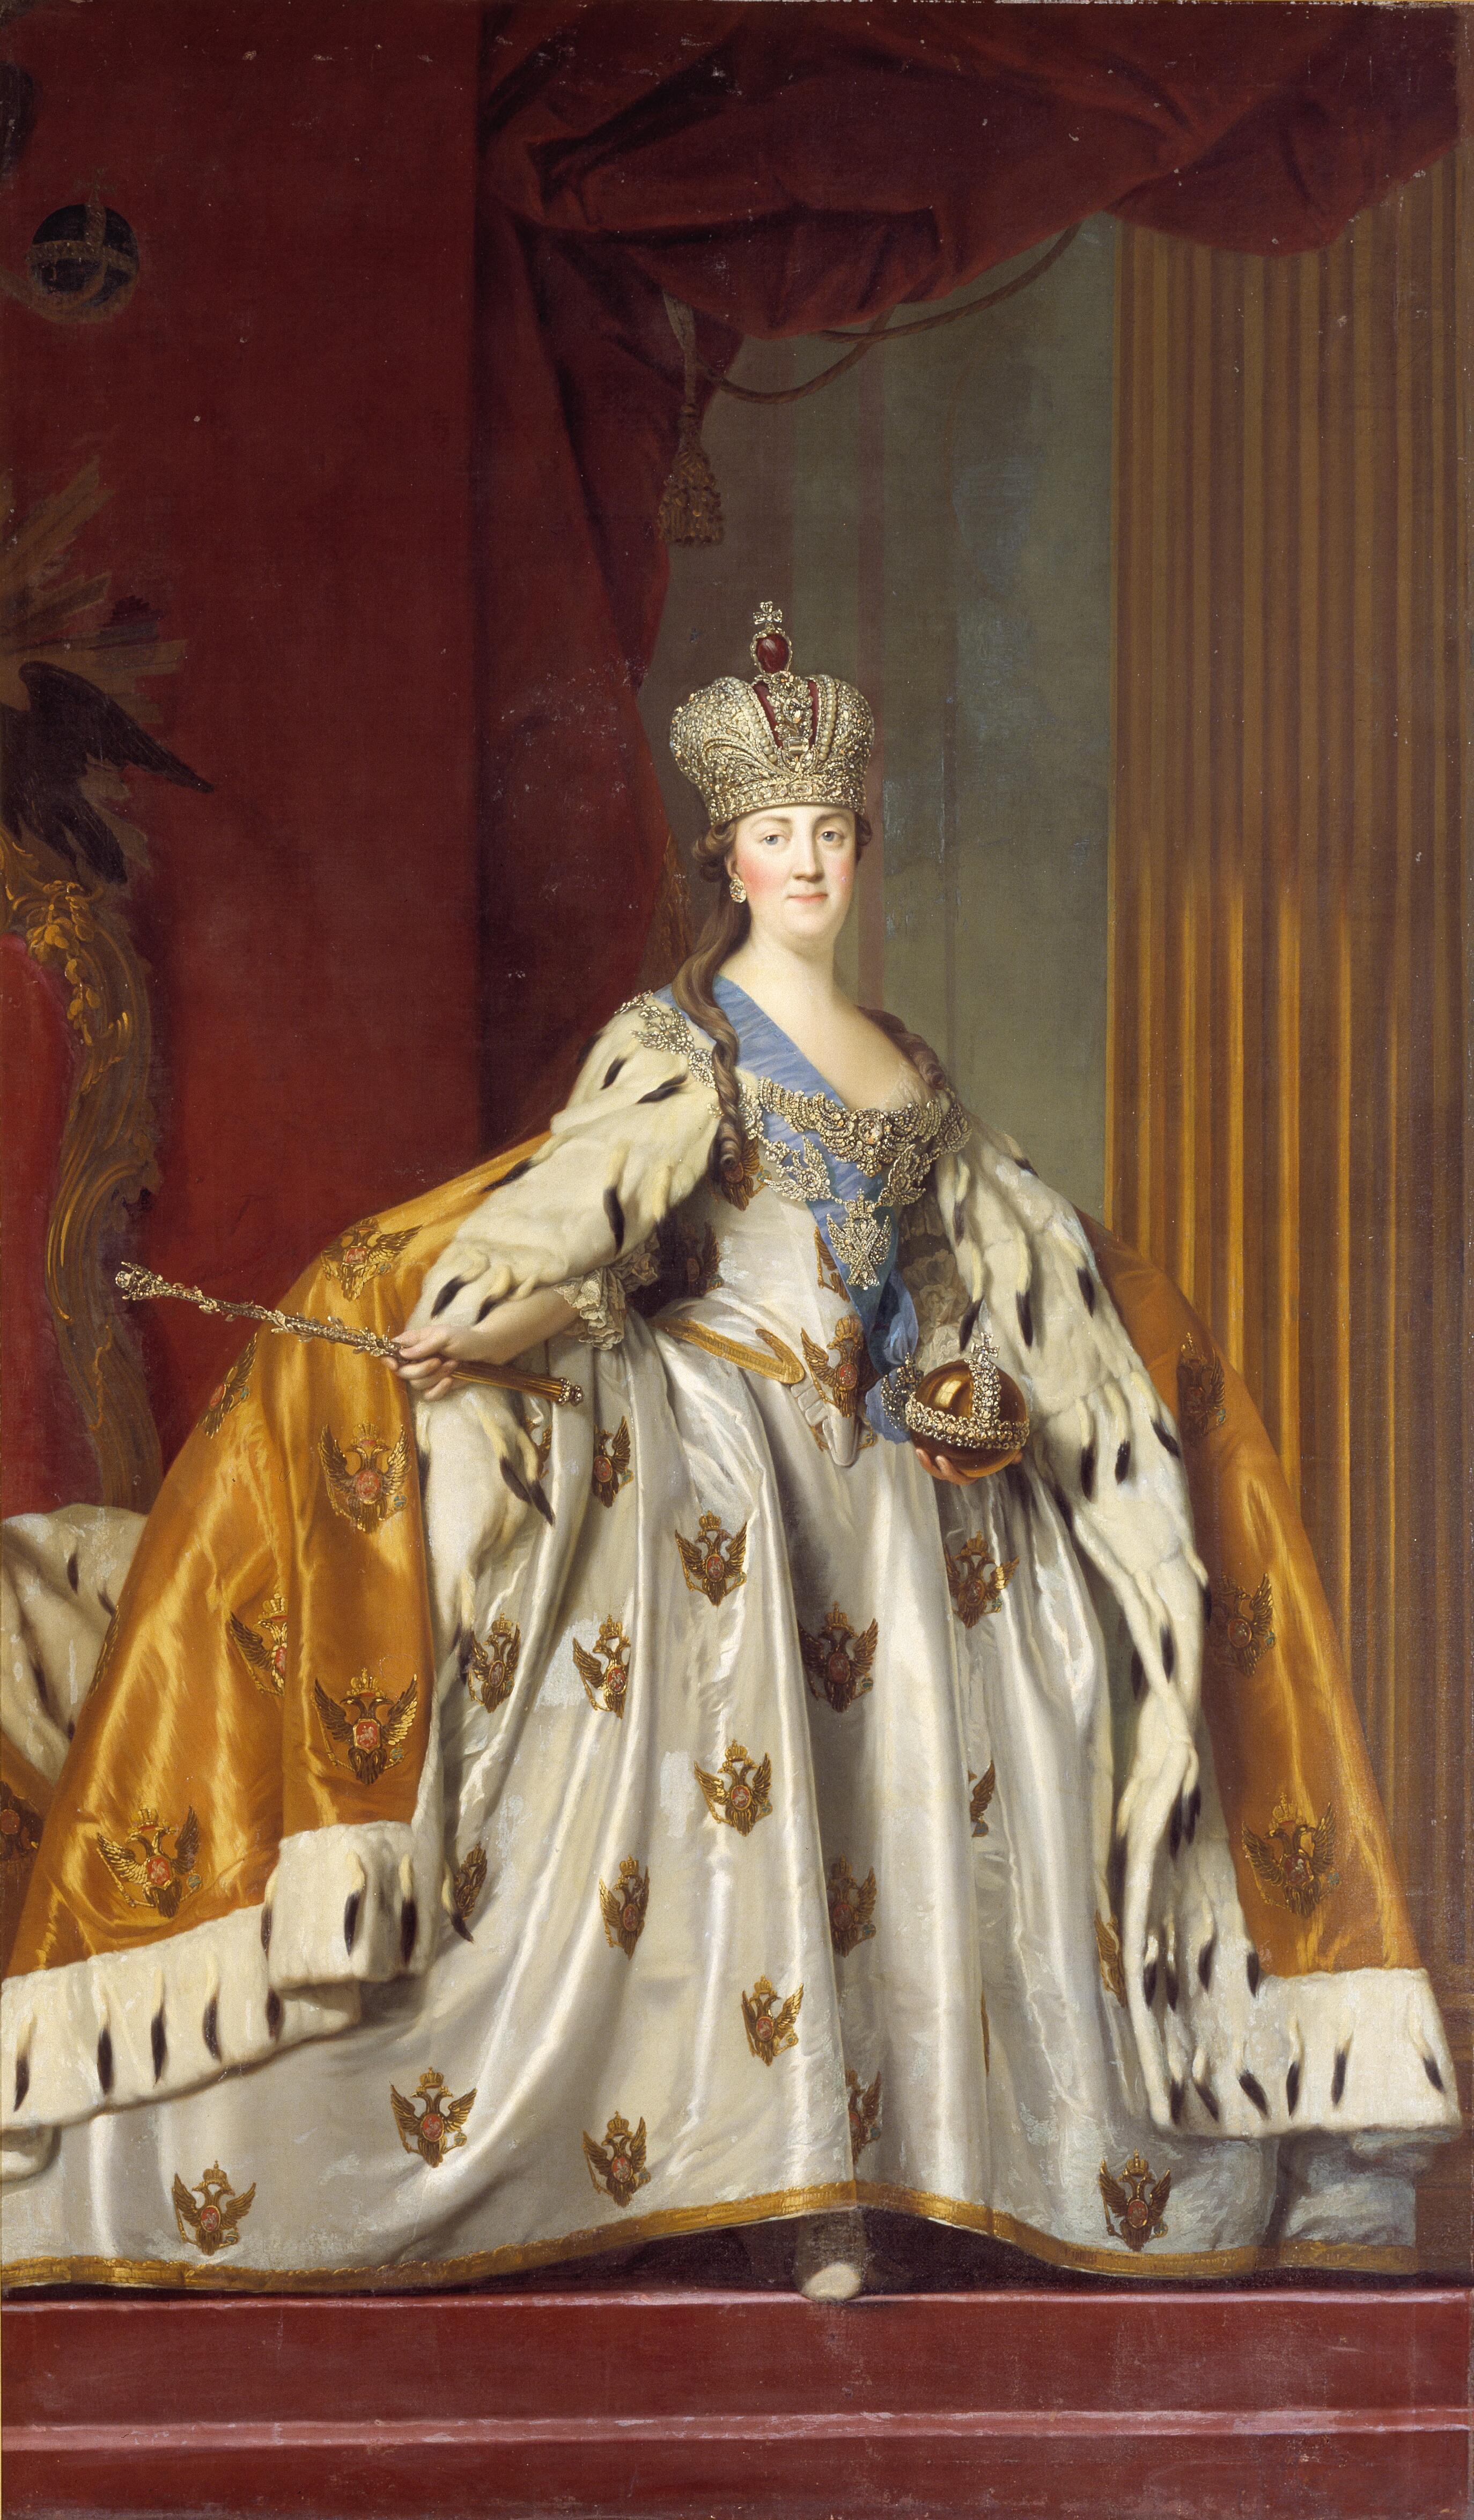 Depiction of Catalina II de Rusia